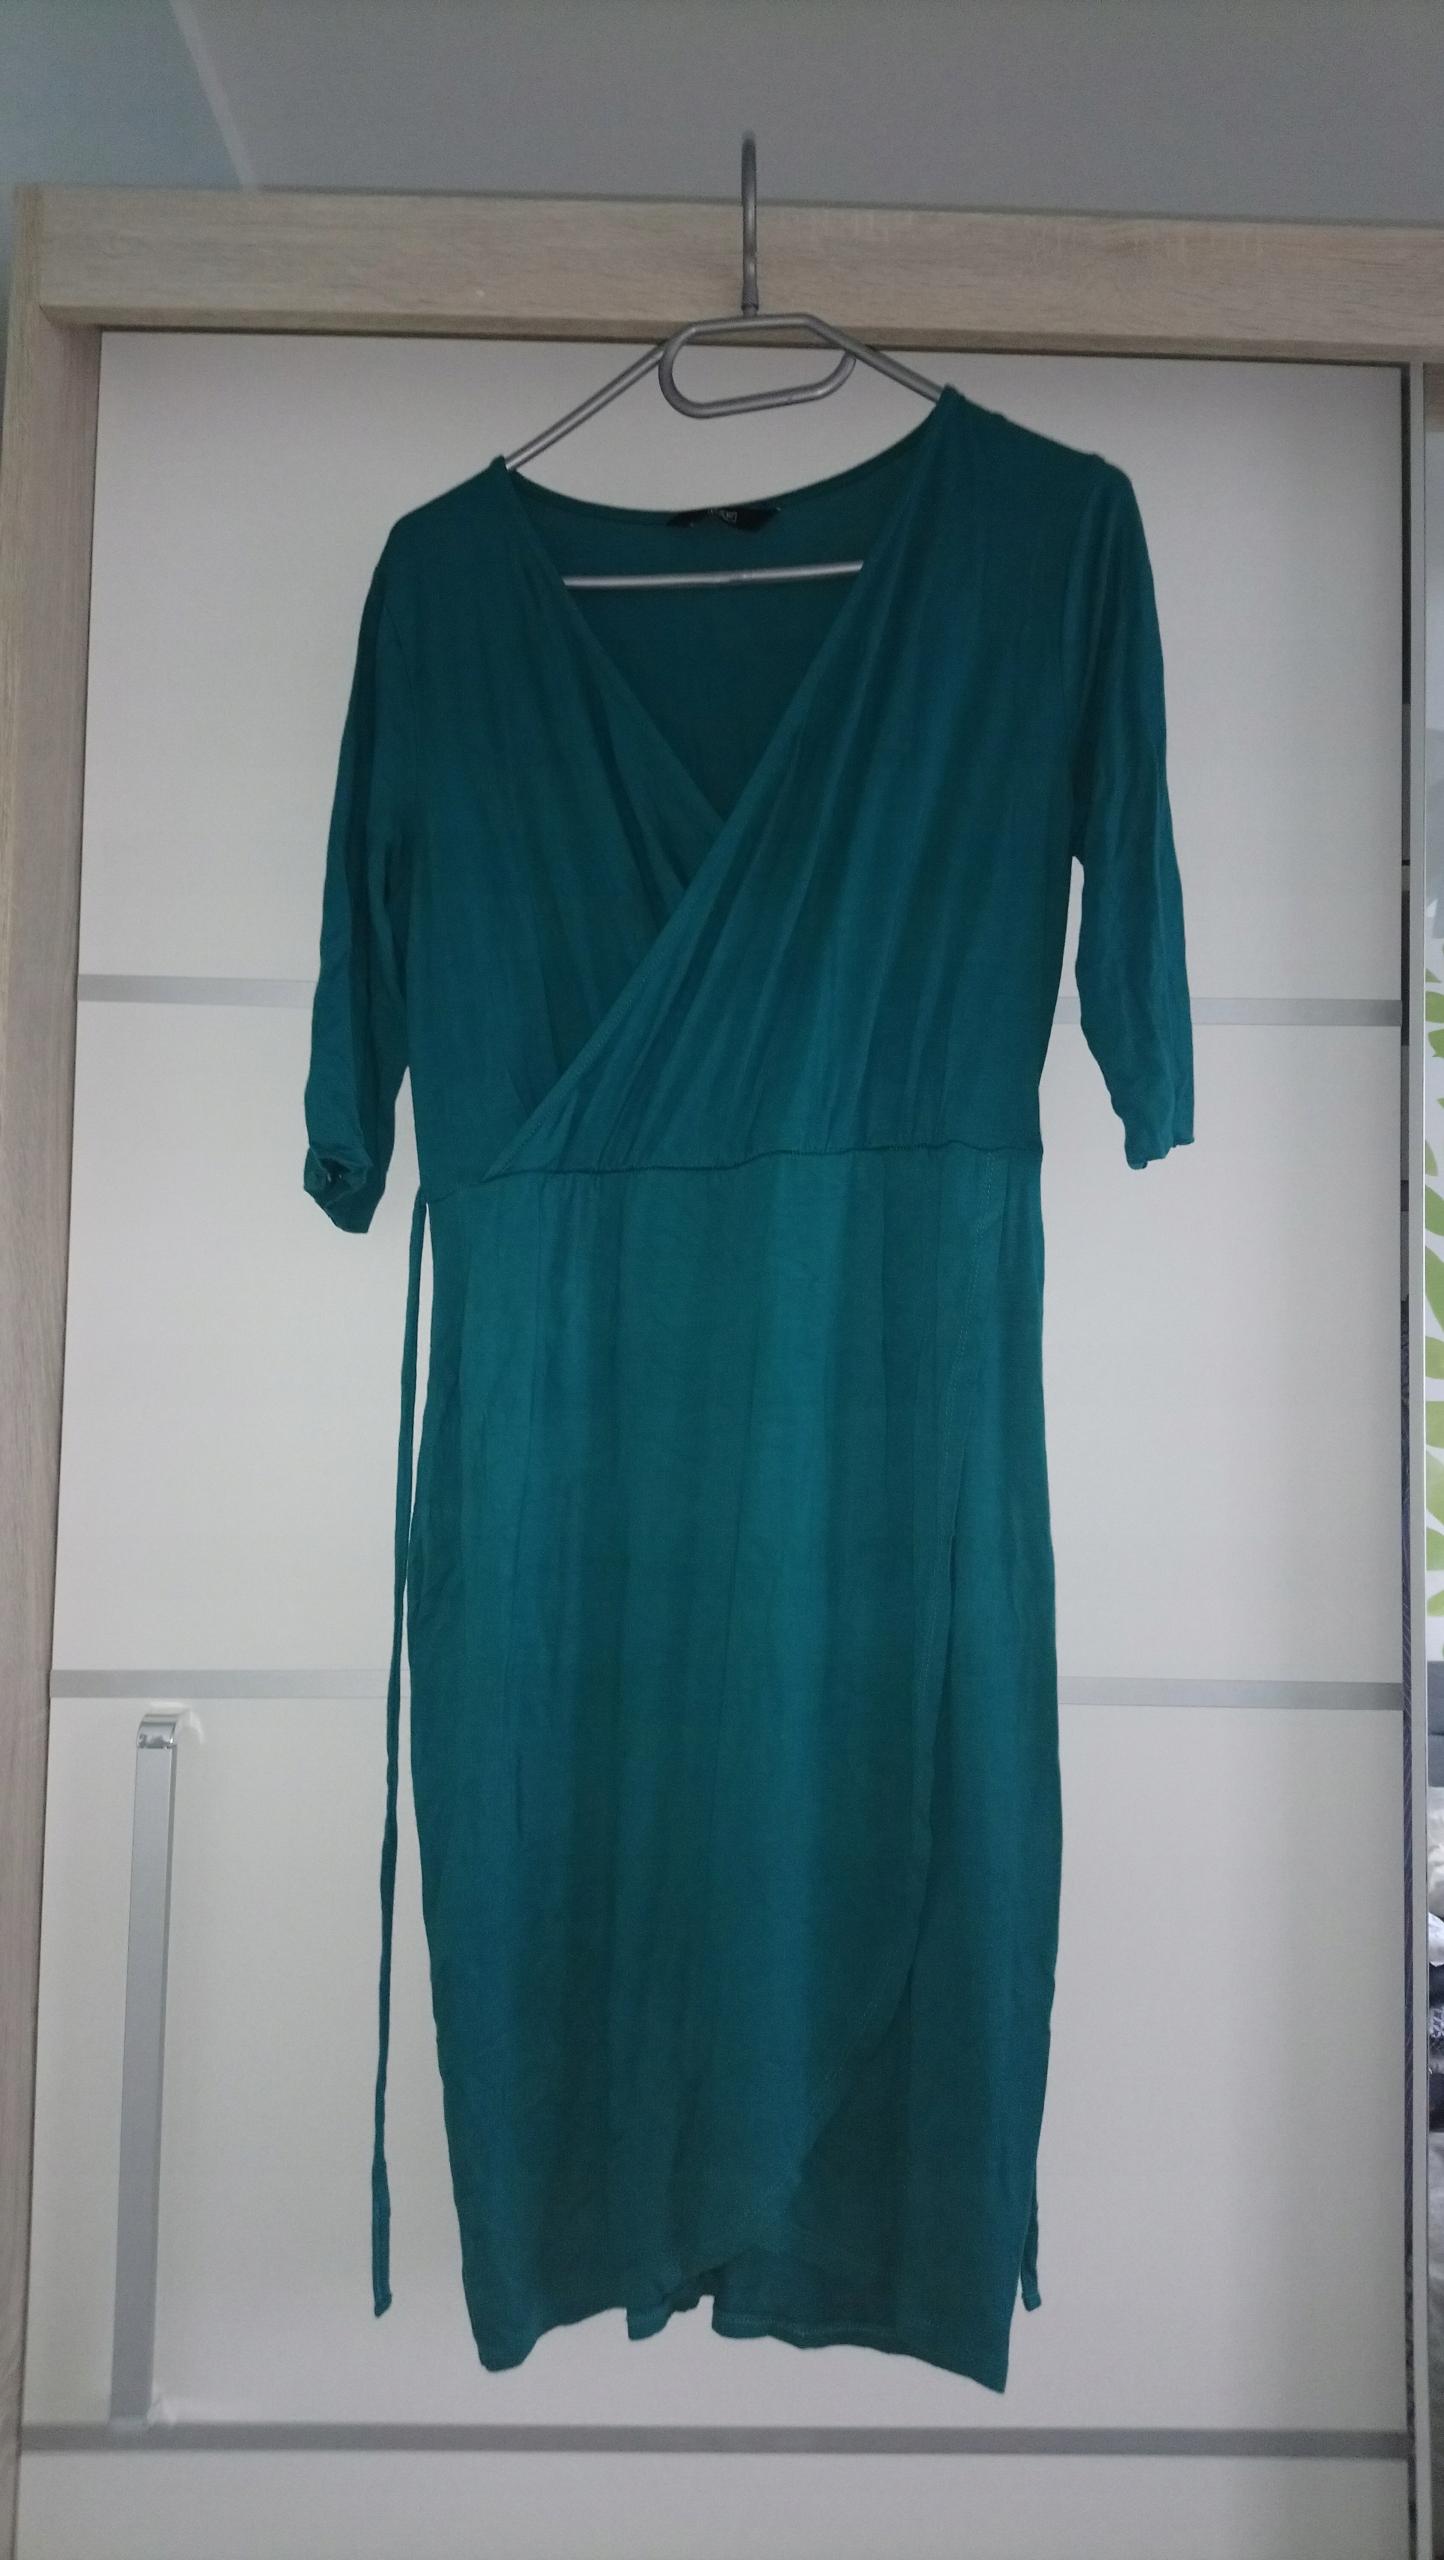 Kopertowa sukienka F&F 38 butelkowa zieleń